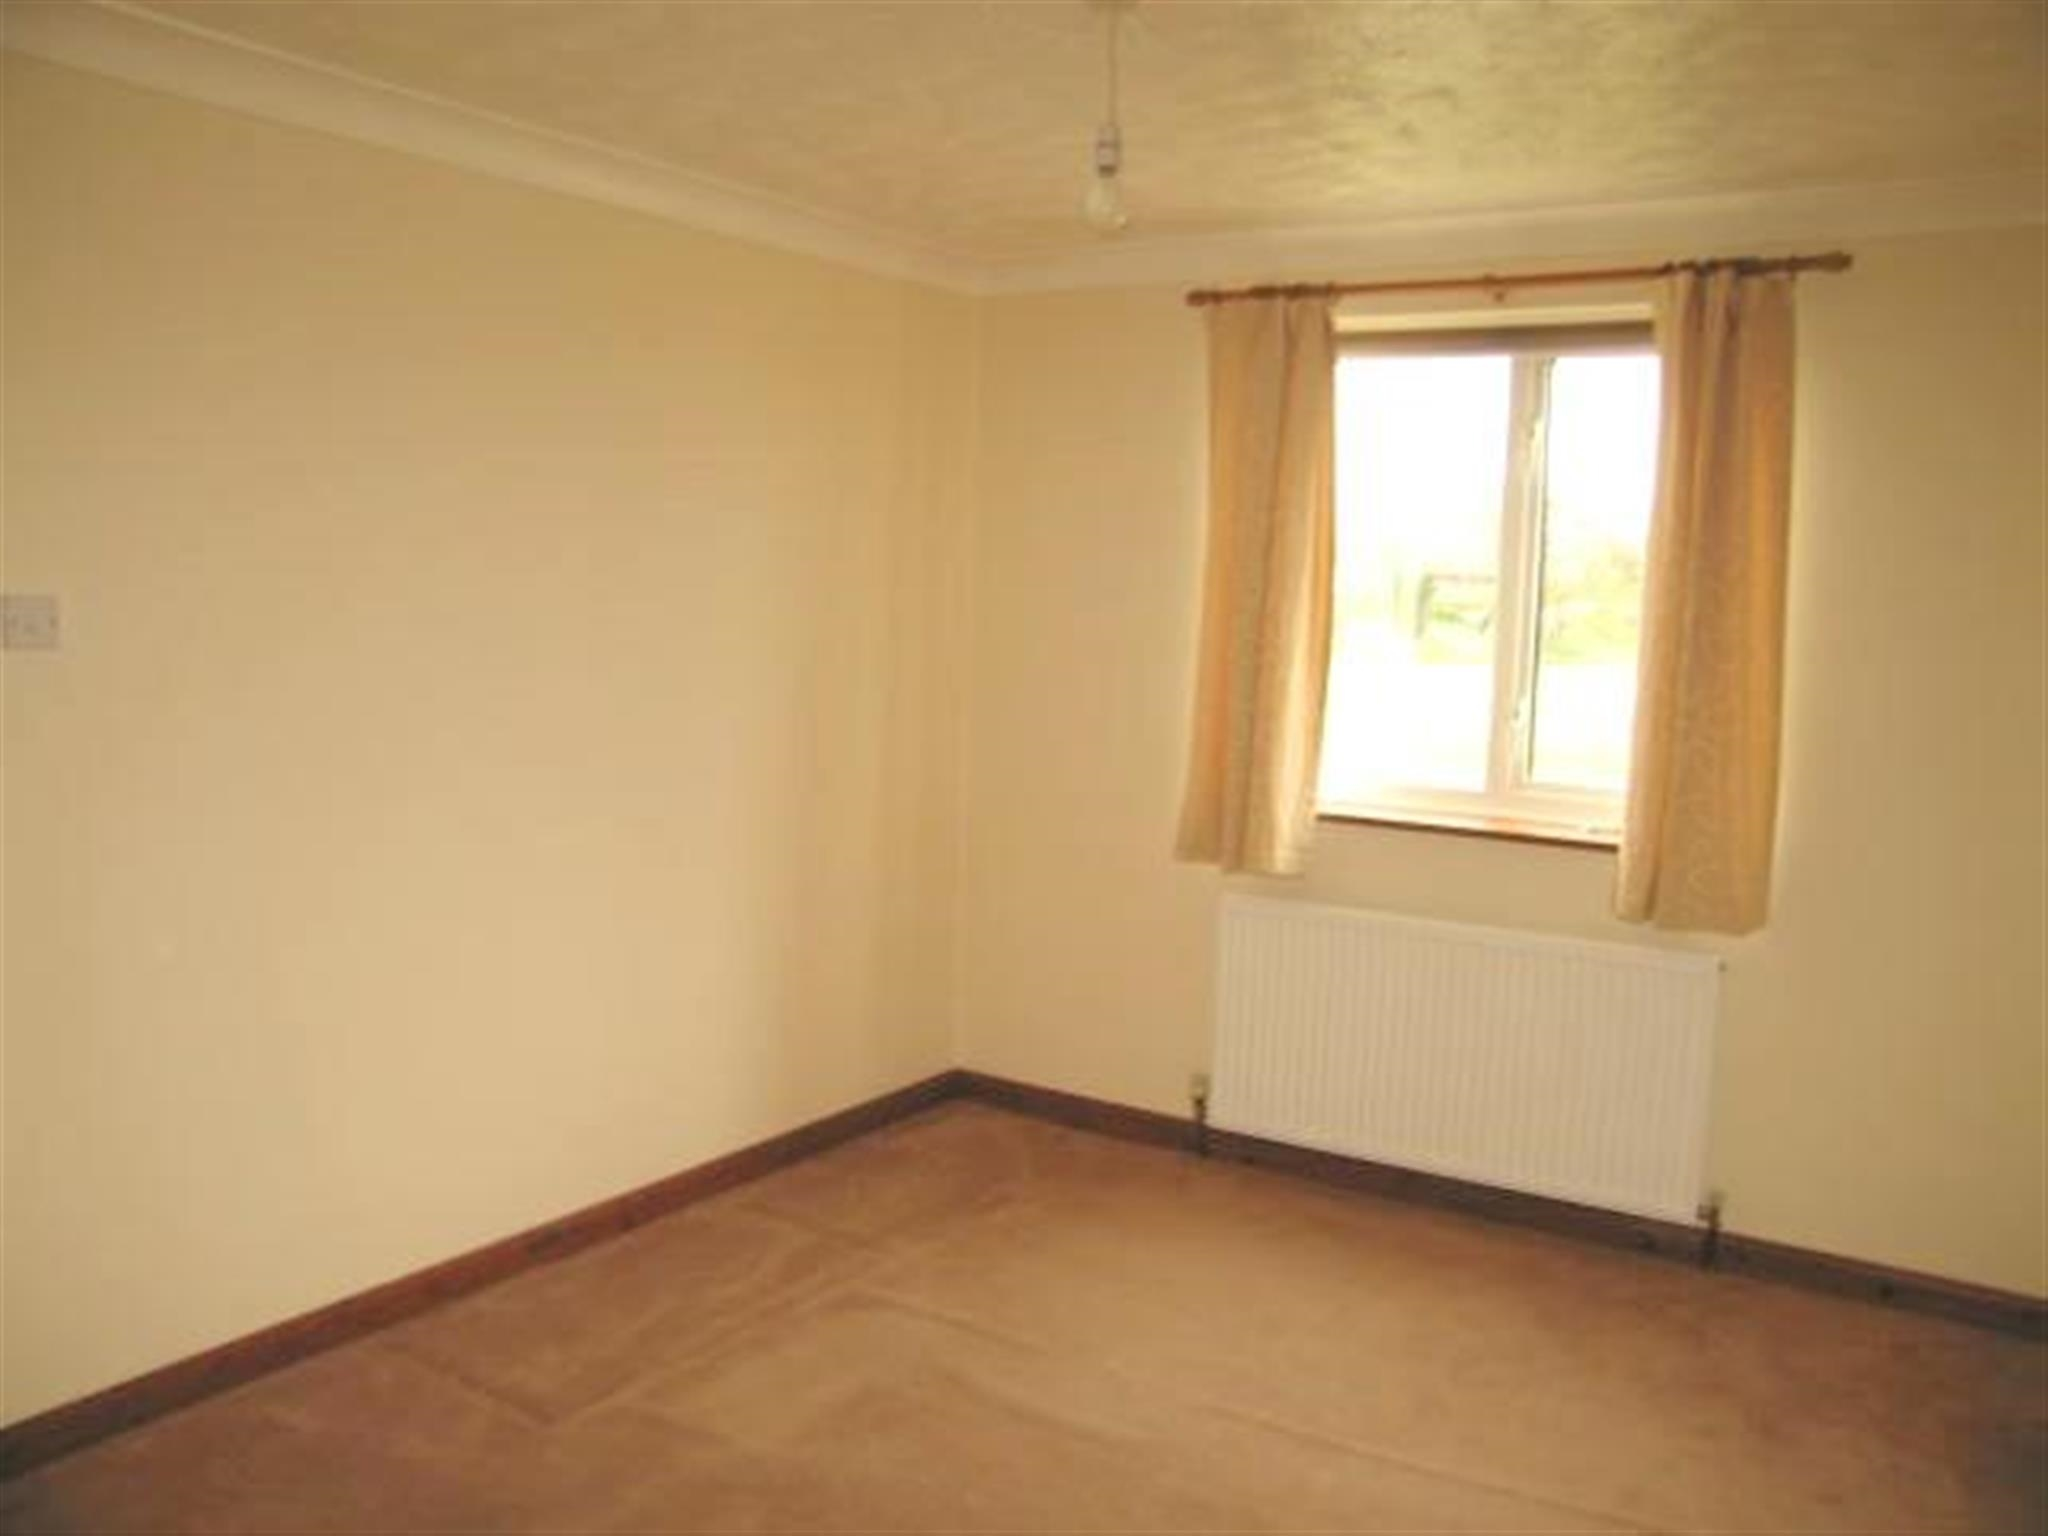 Wisbech Room To Rent